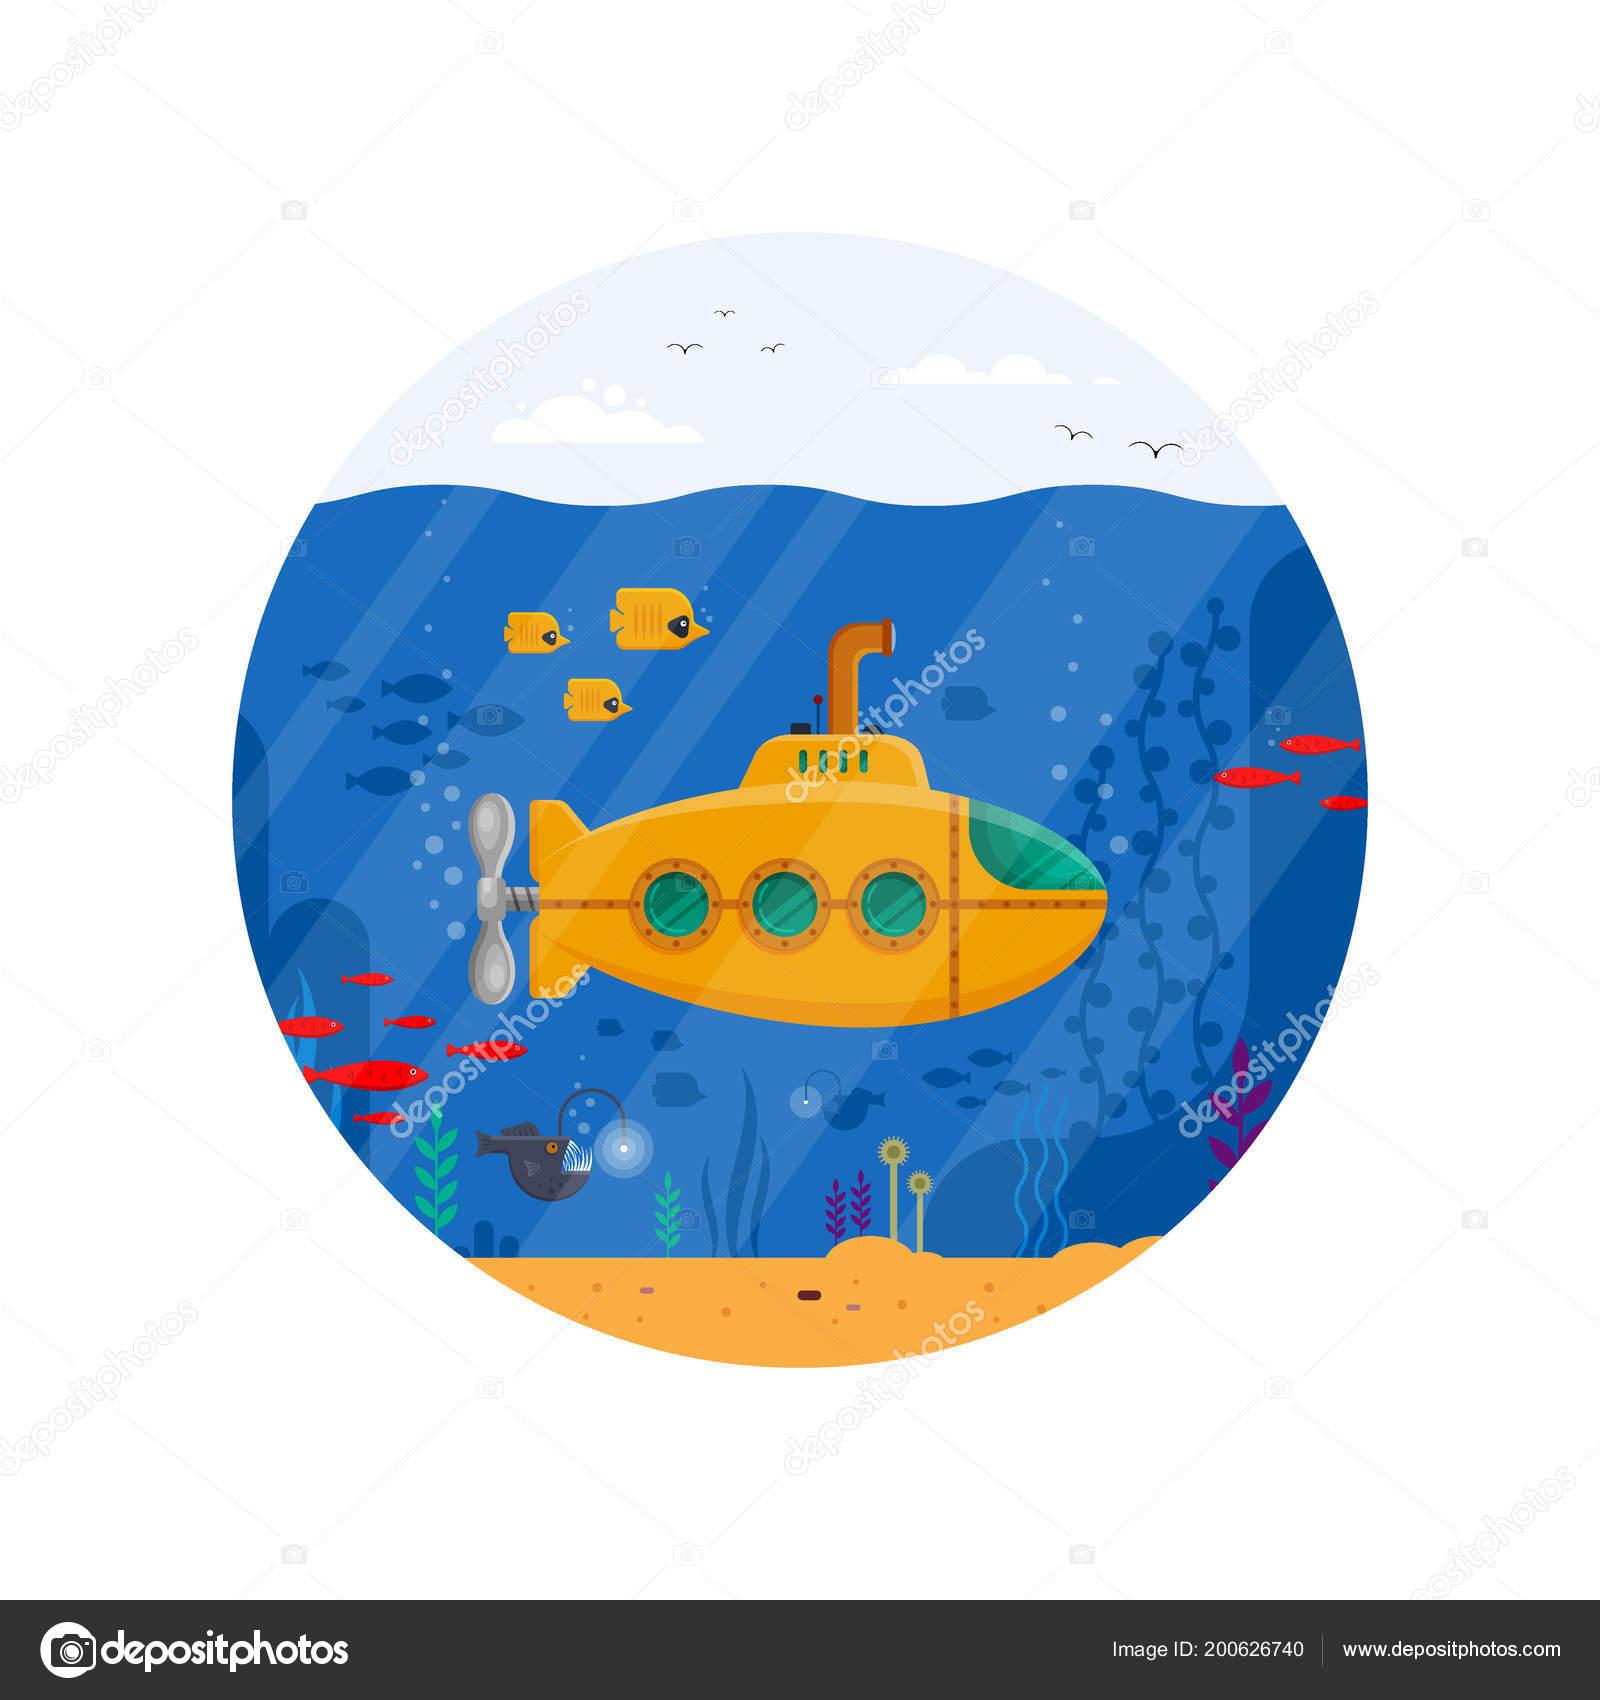 yellow submarine with periscope underwater concept in circle marine